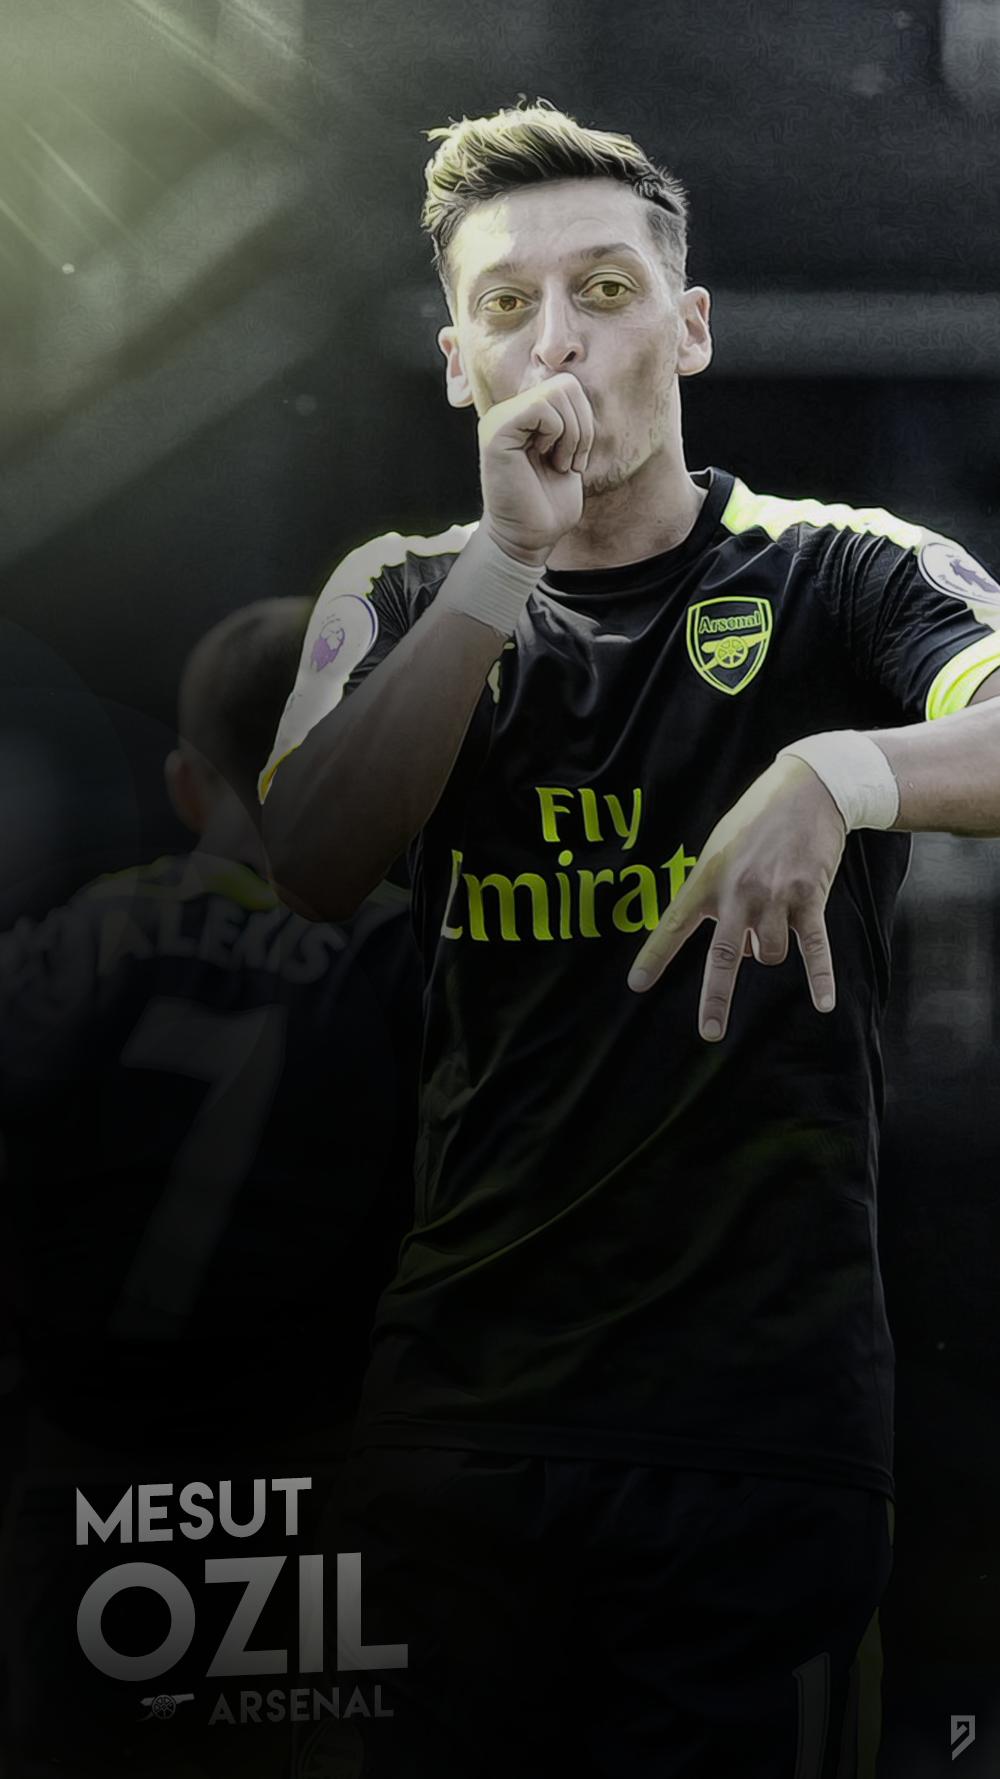 Mesut Ozil Wallpaper - Arsenal by abgrafix96 on DeviantArt